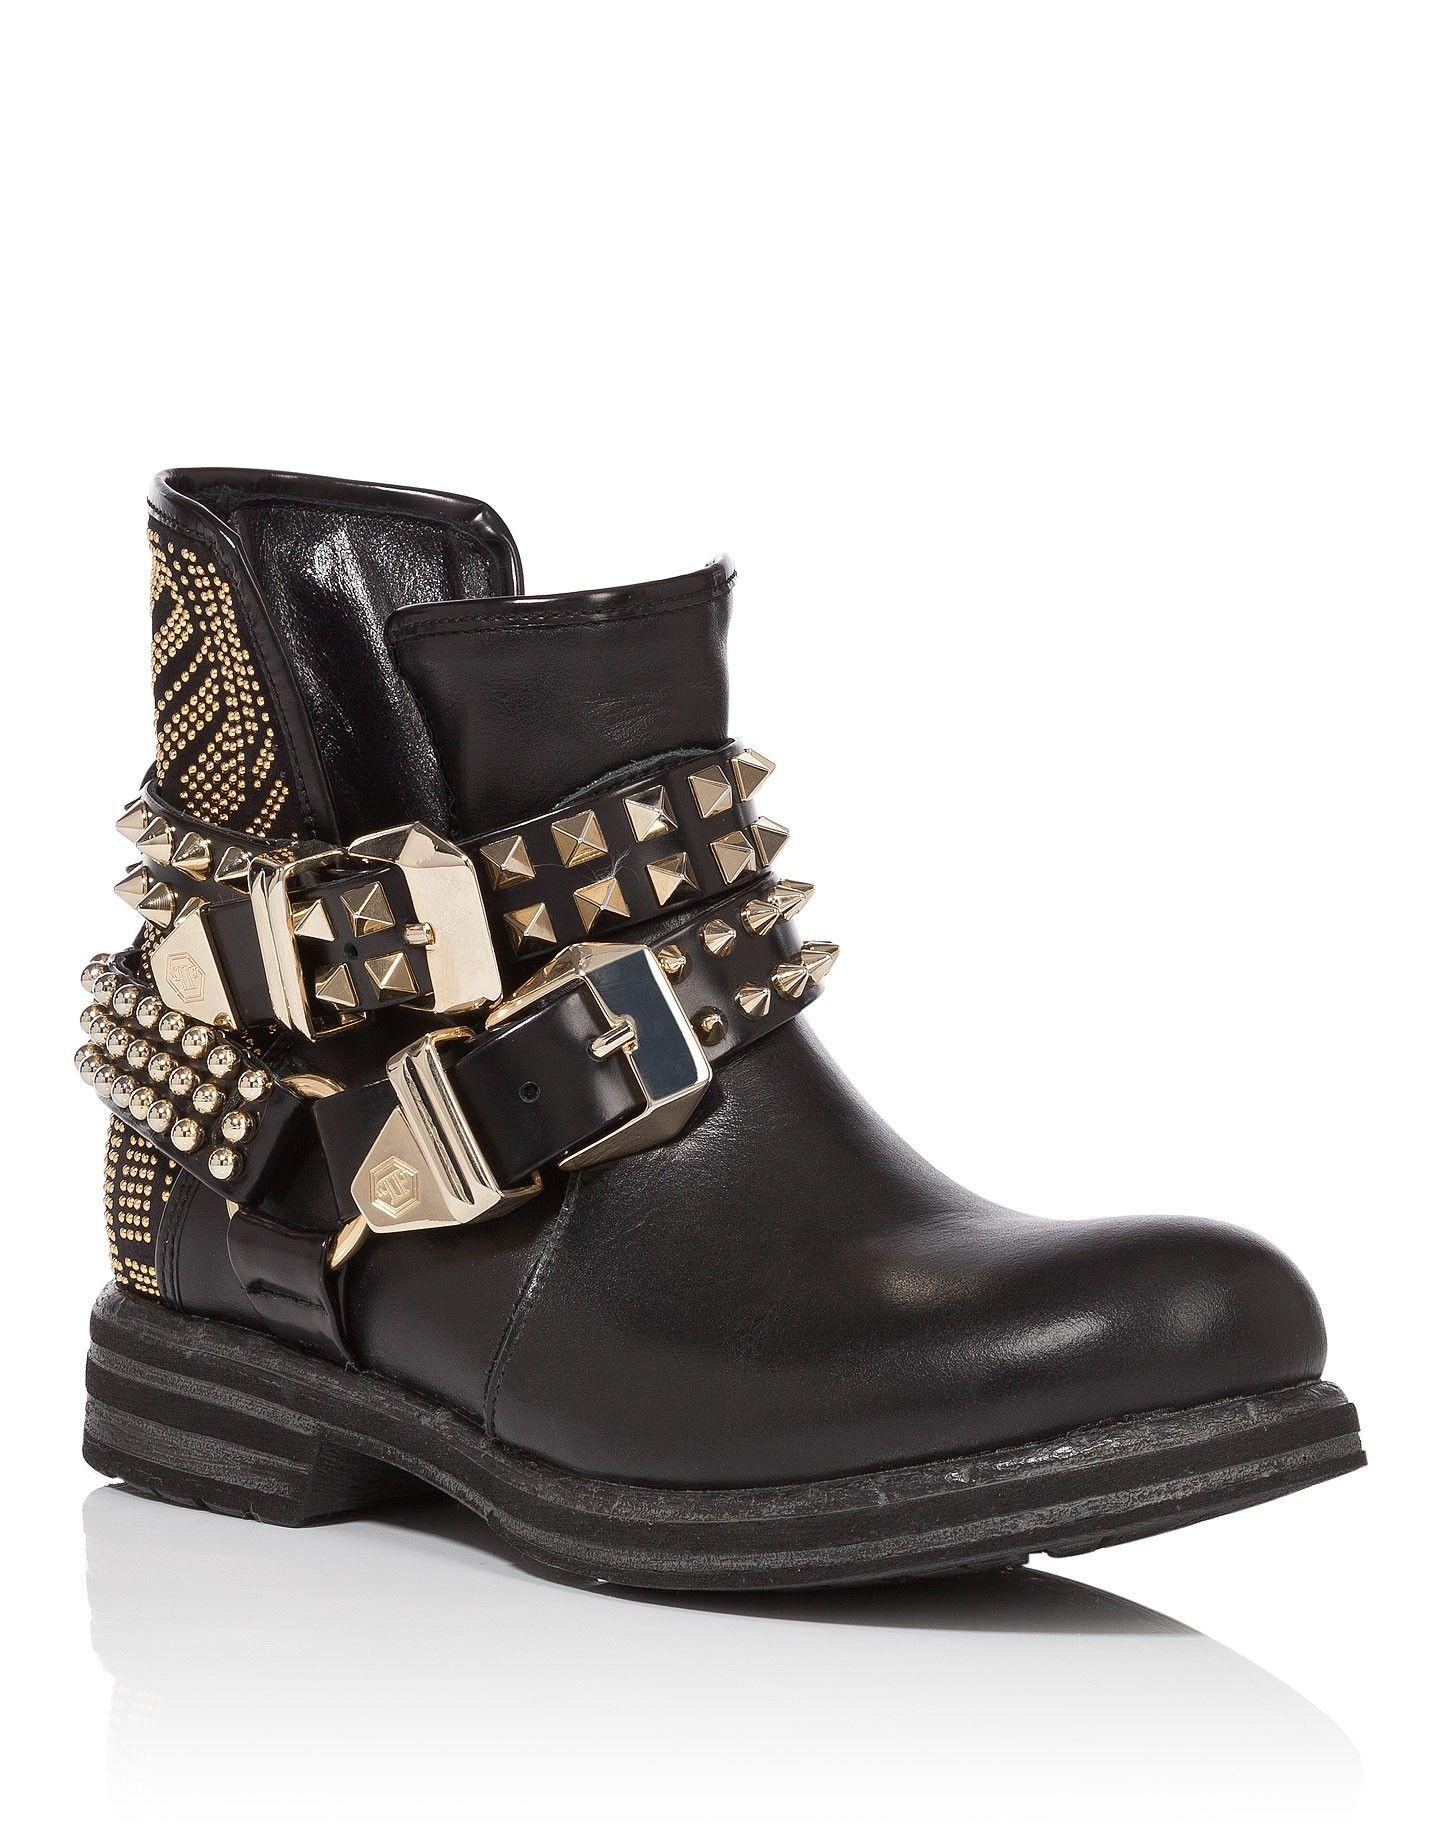 FOOTWEAR - Shoe boots Philipp Plein hvmlPPrF46